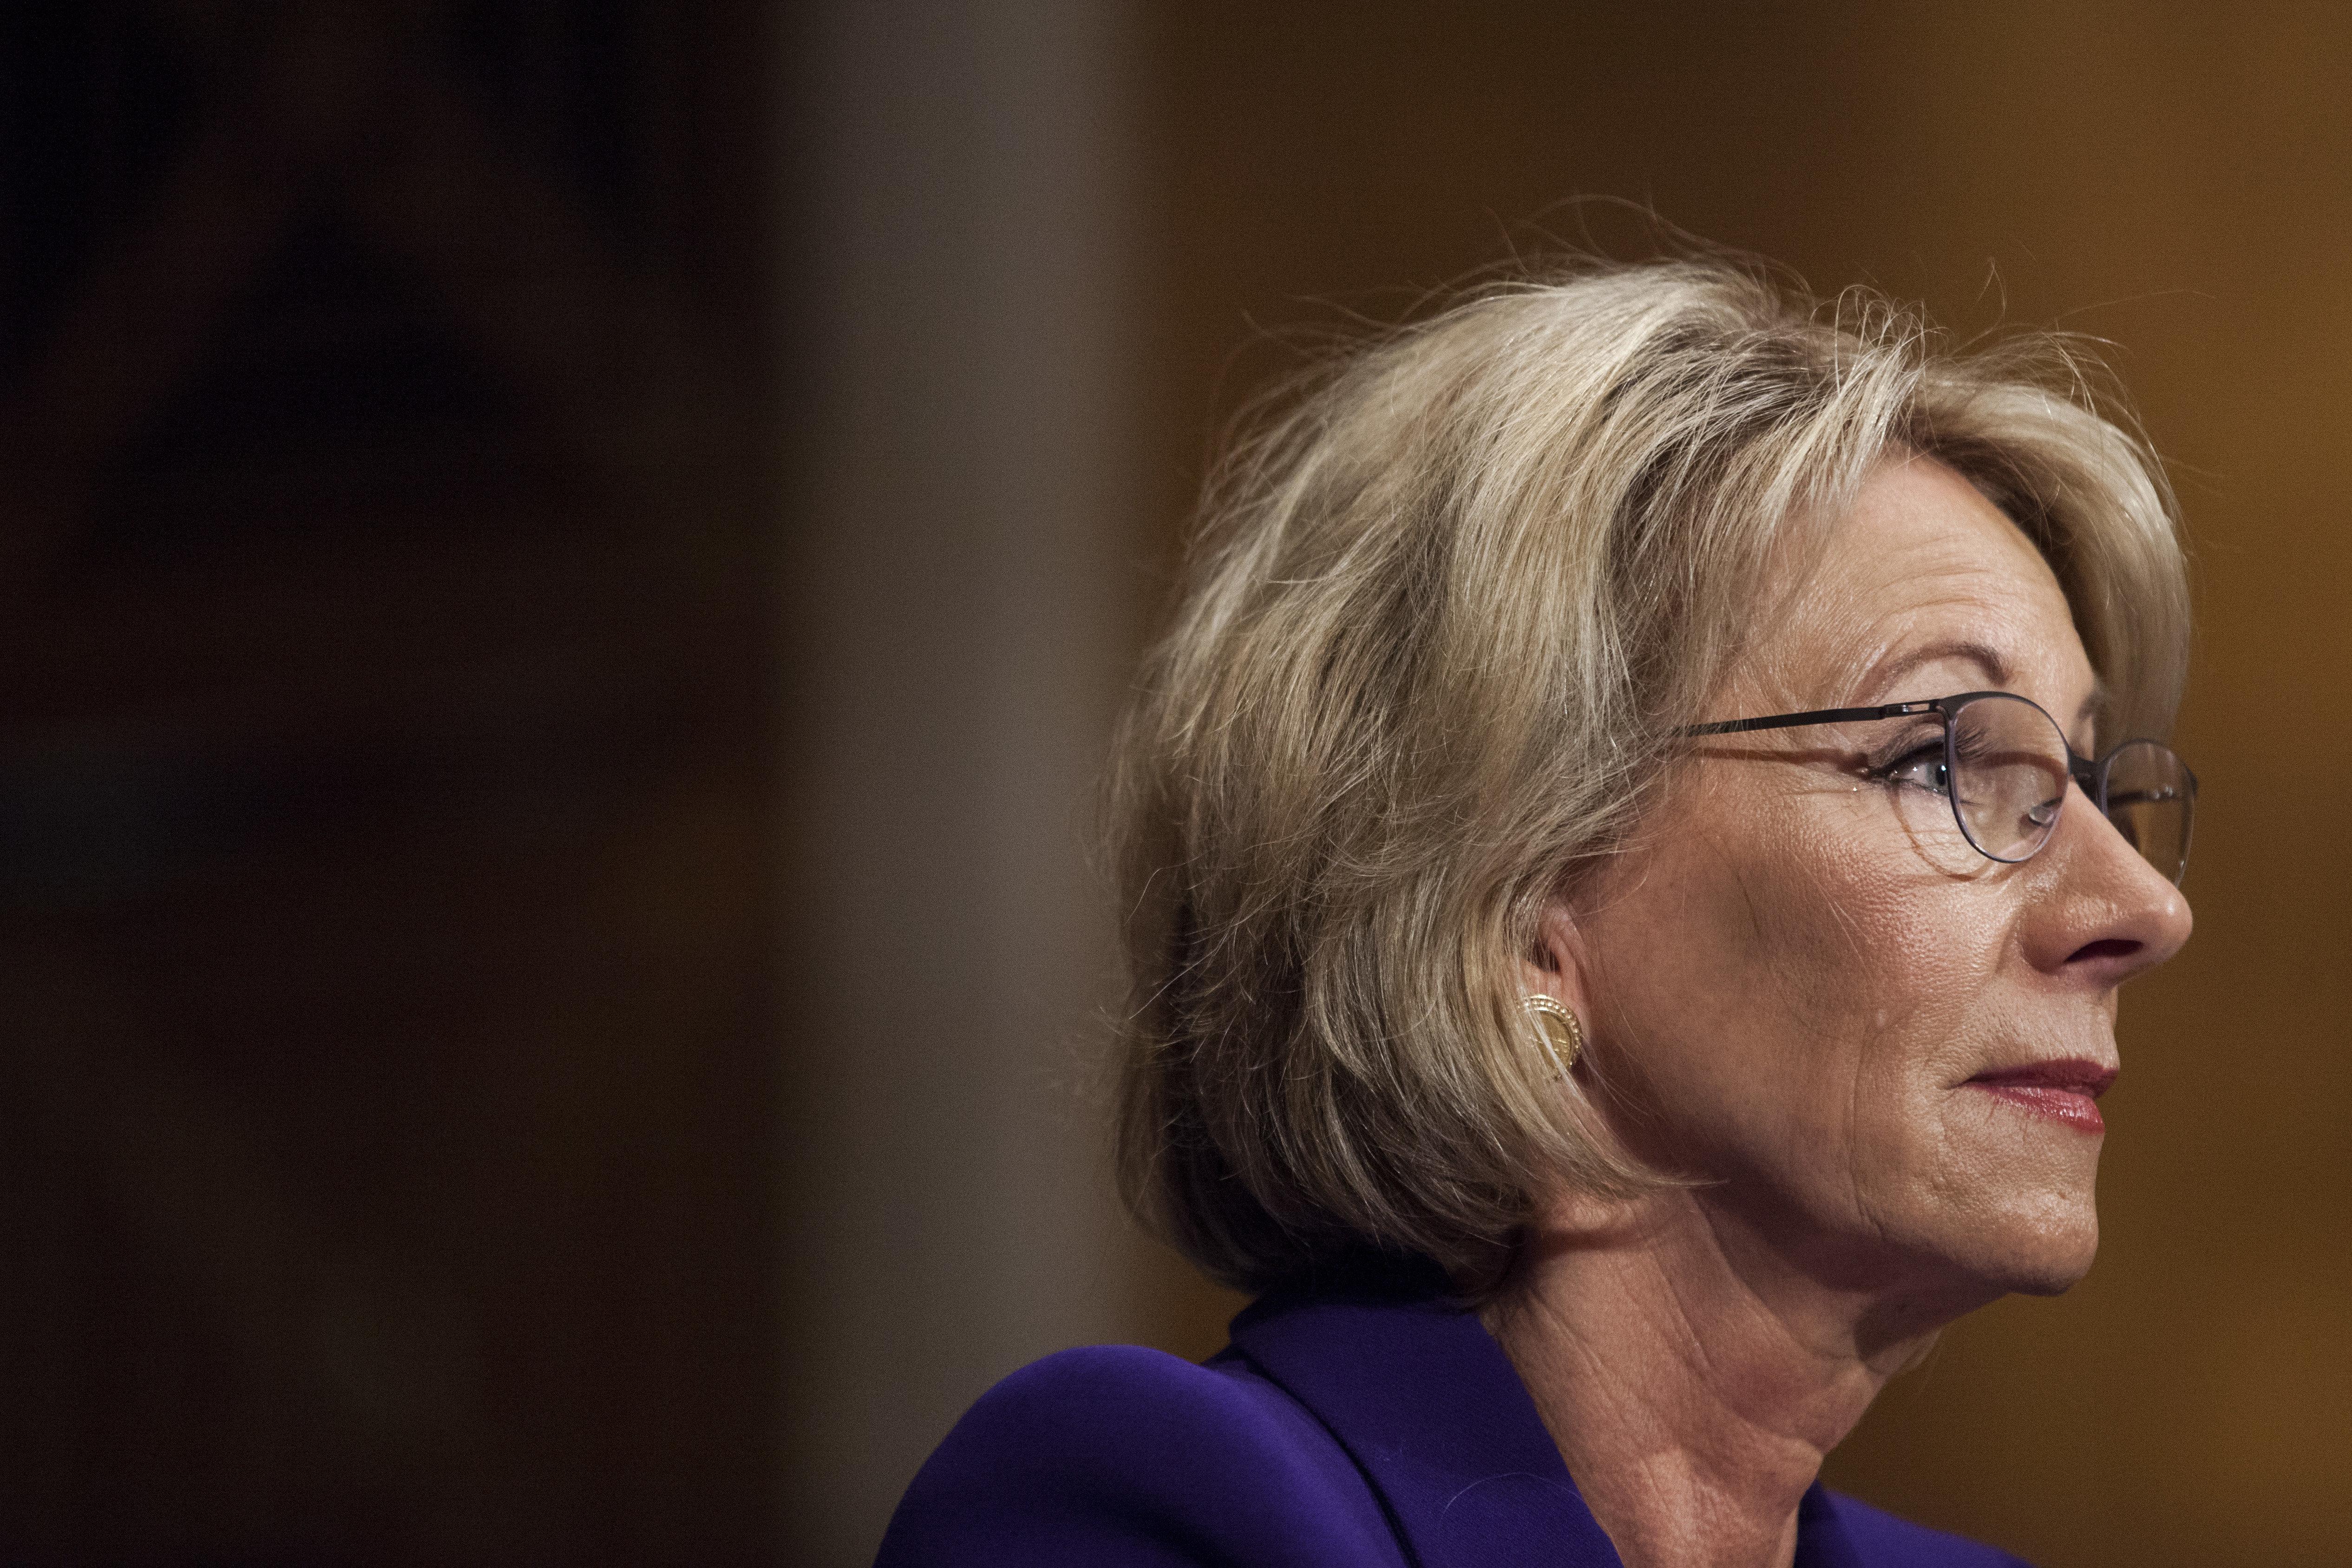 Amid Backlash, Betsy DeVos Made U.S. Education Secretary In Tie-Breaker